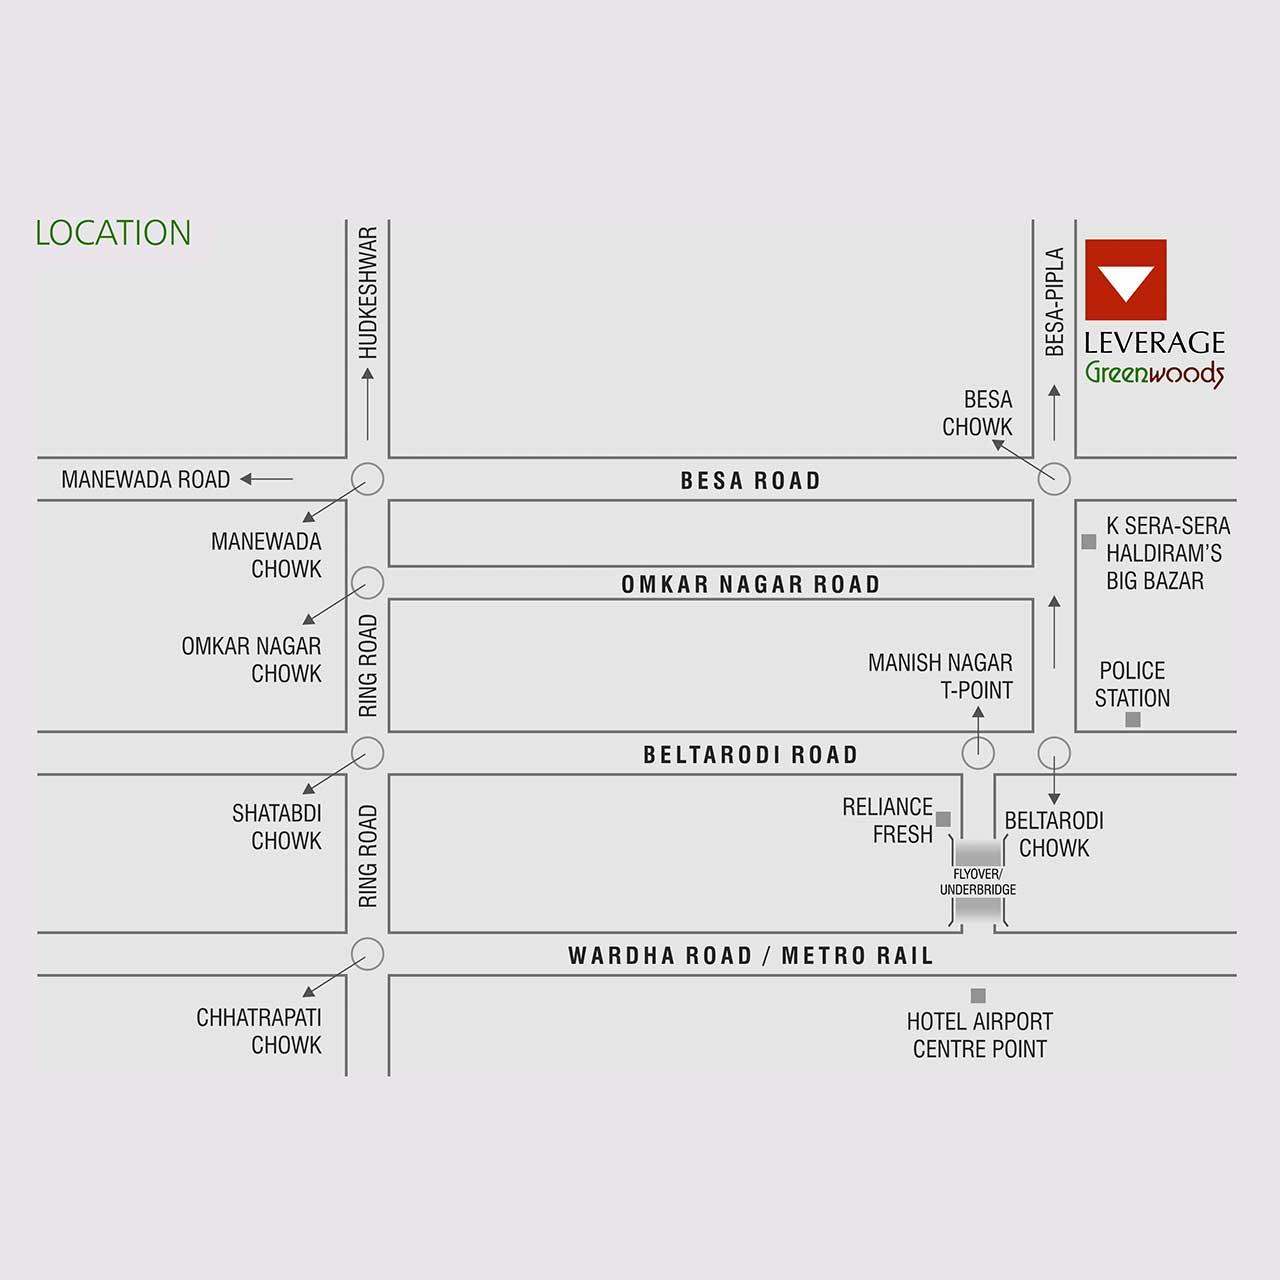 leverage-greenwood-harmony-location-map